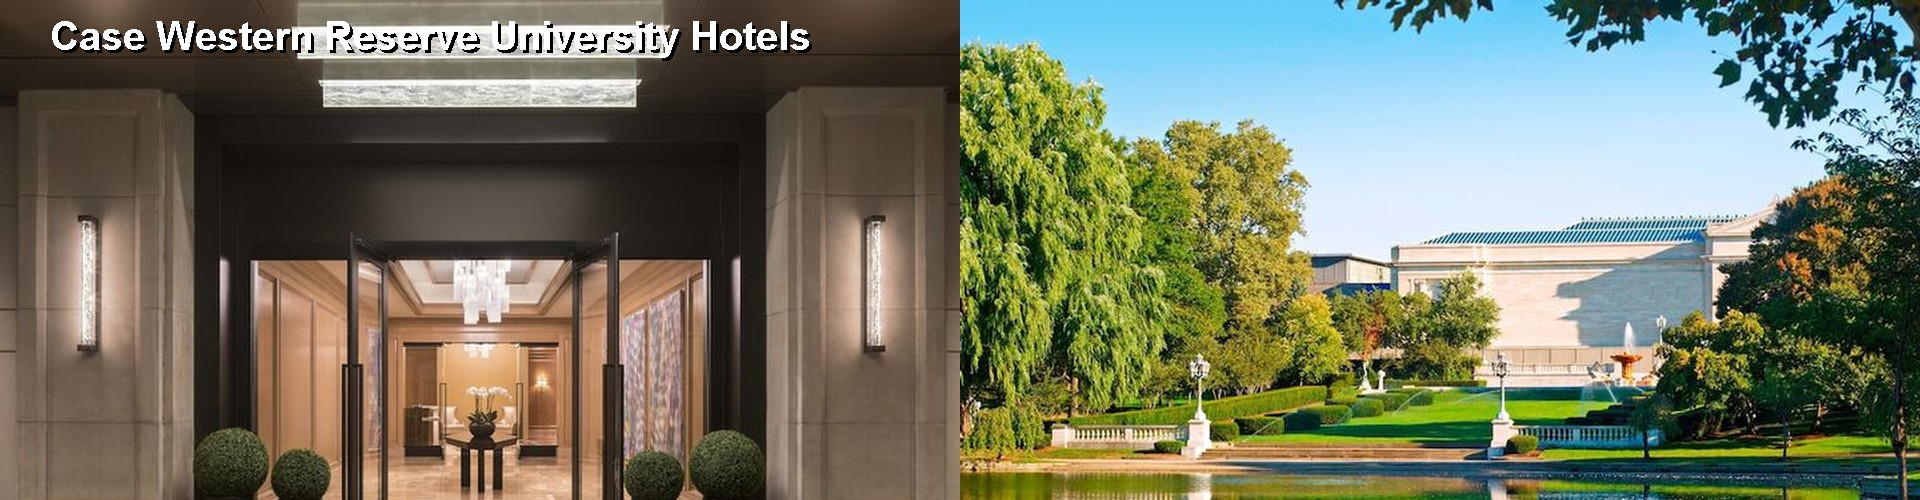 5 Best Hotels Near Case Western Reserve University